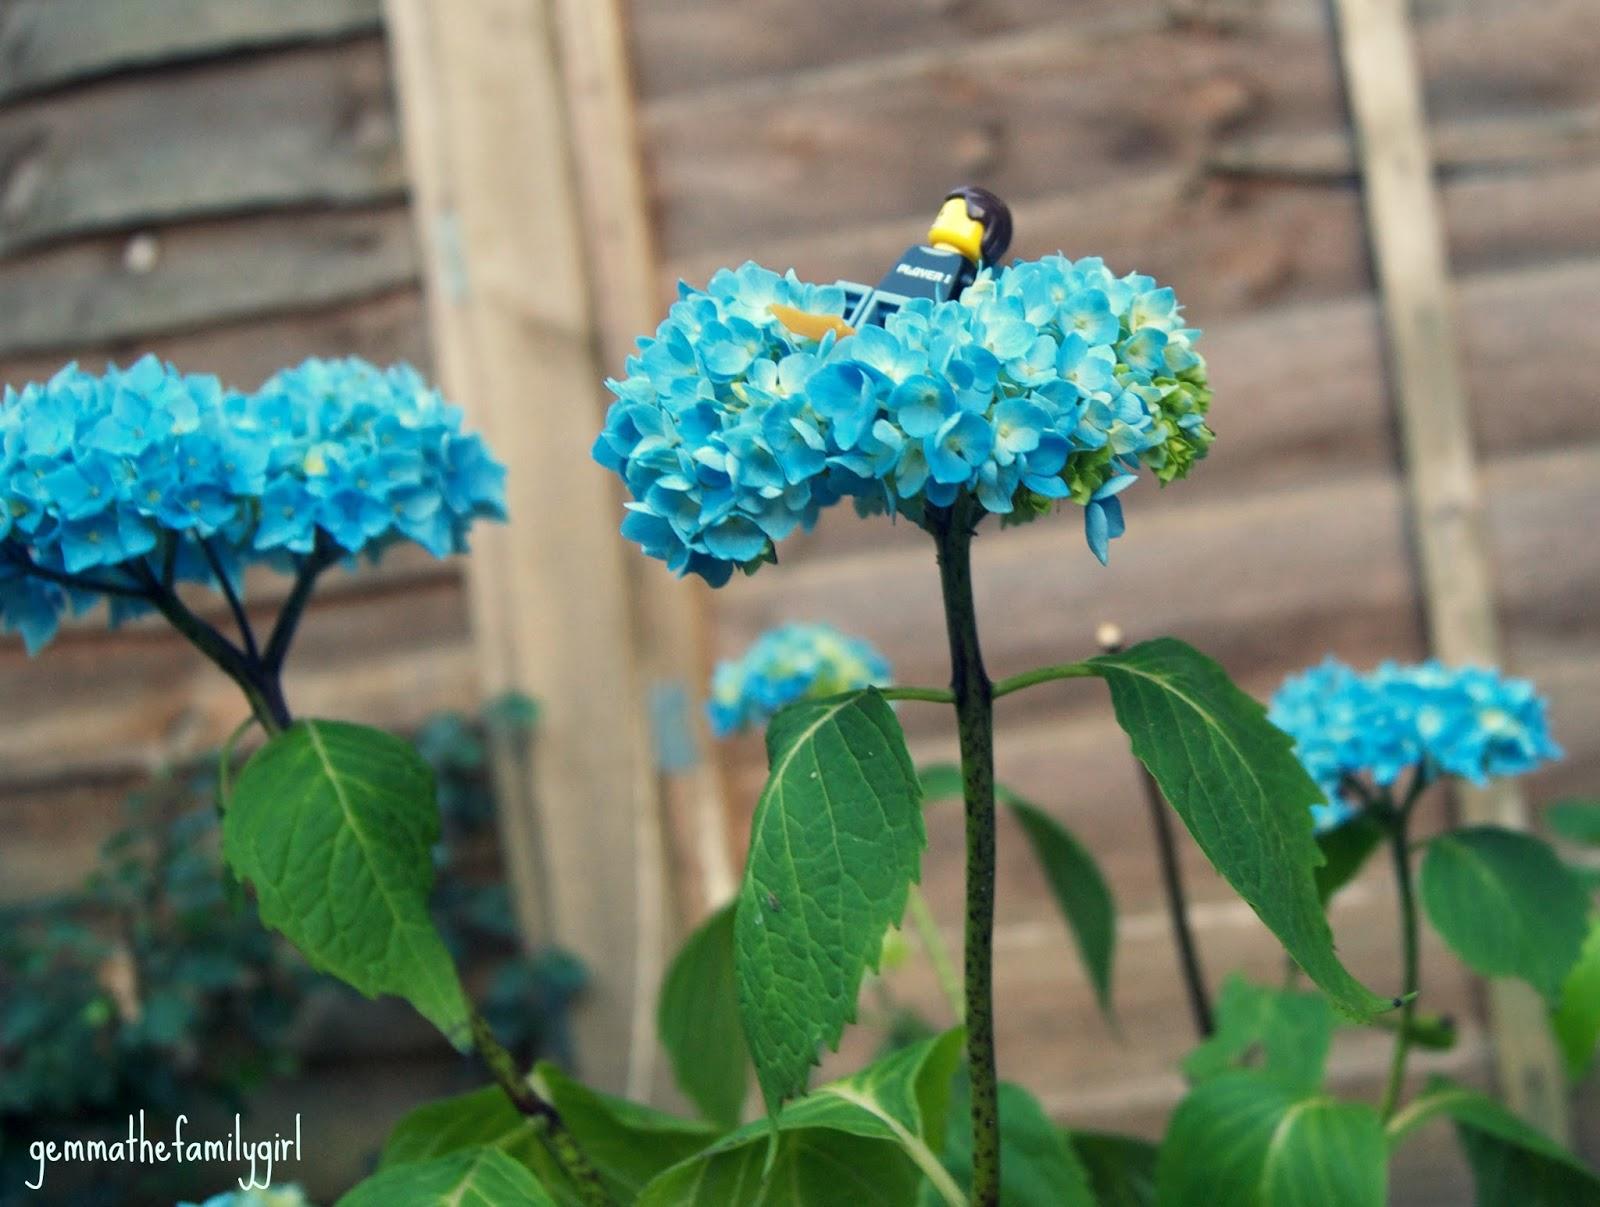 lego, geek, mini figure, photography, blue flowers